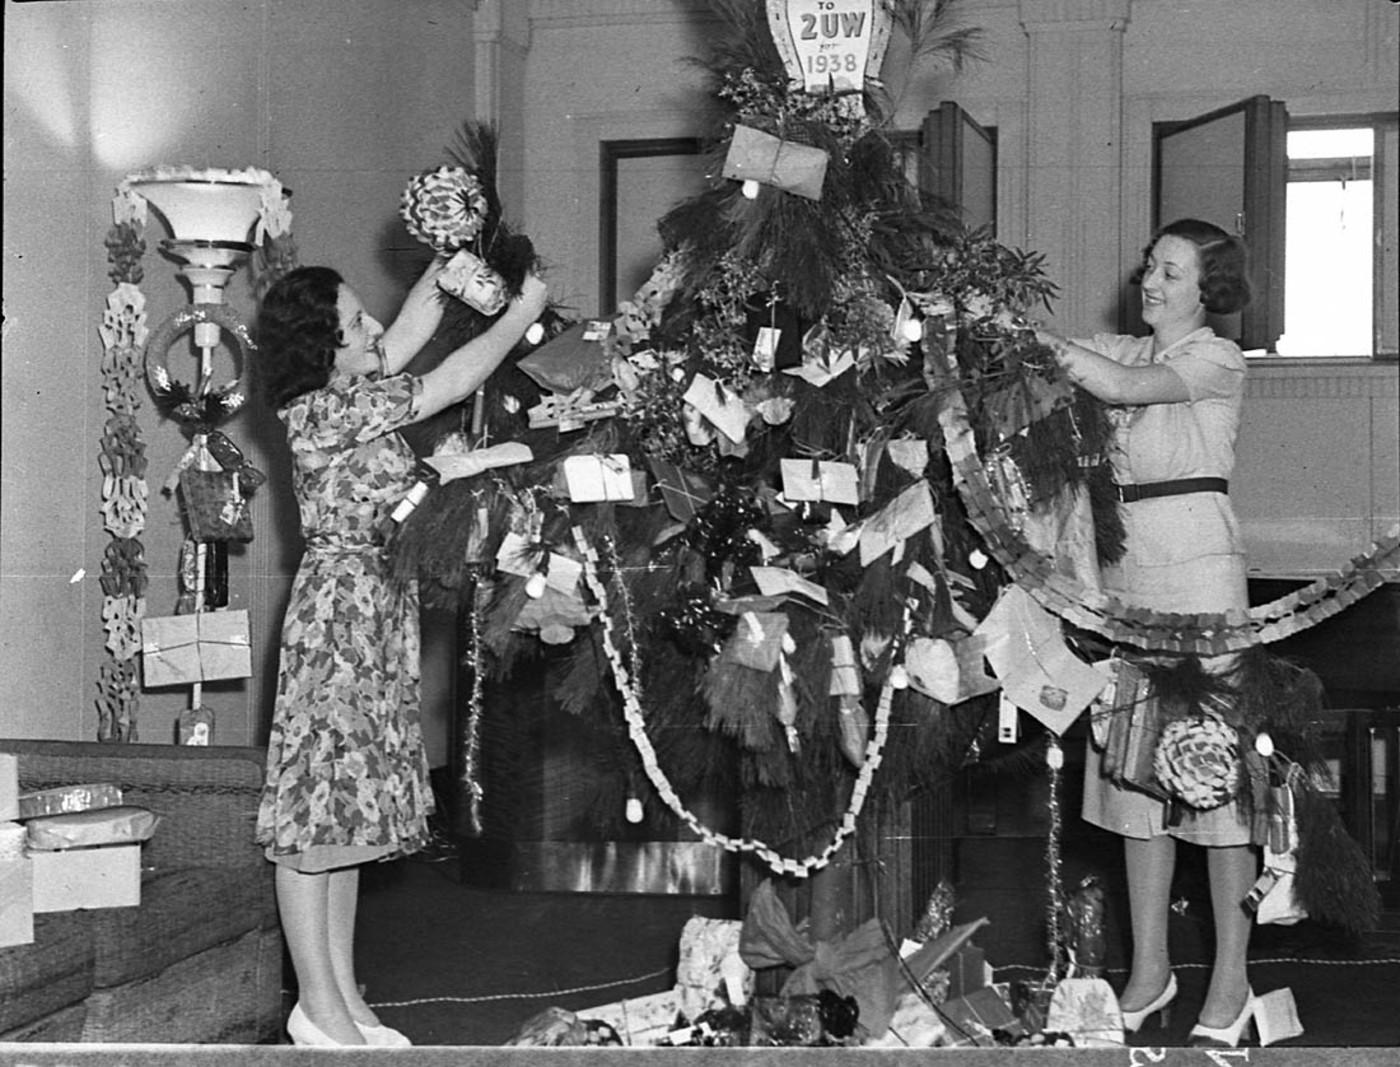 2uw-radio-station-vintage-christmas-tree-decorating